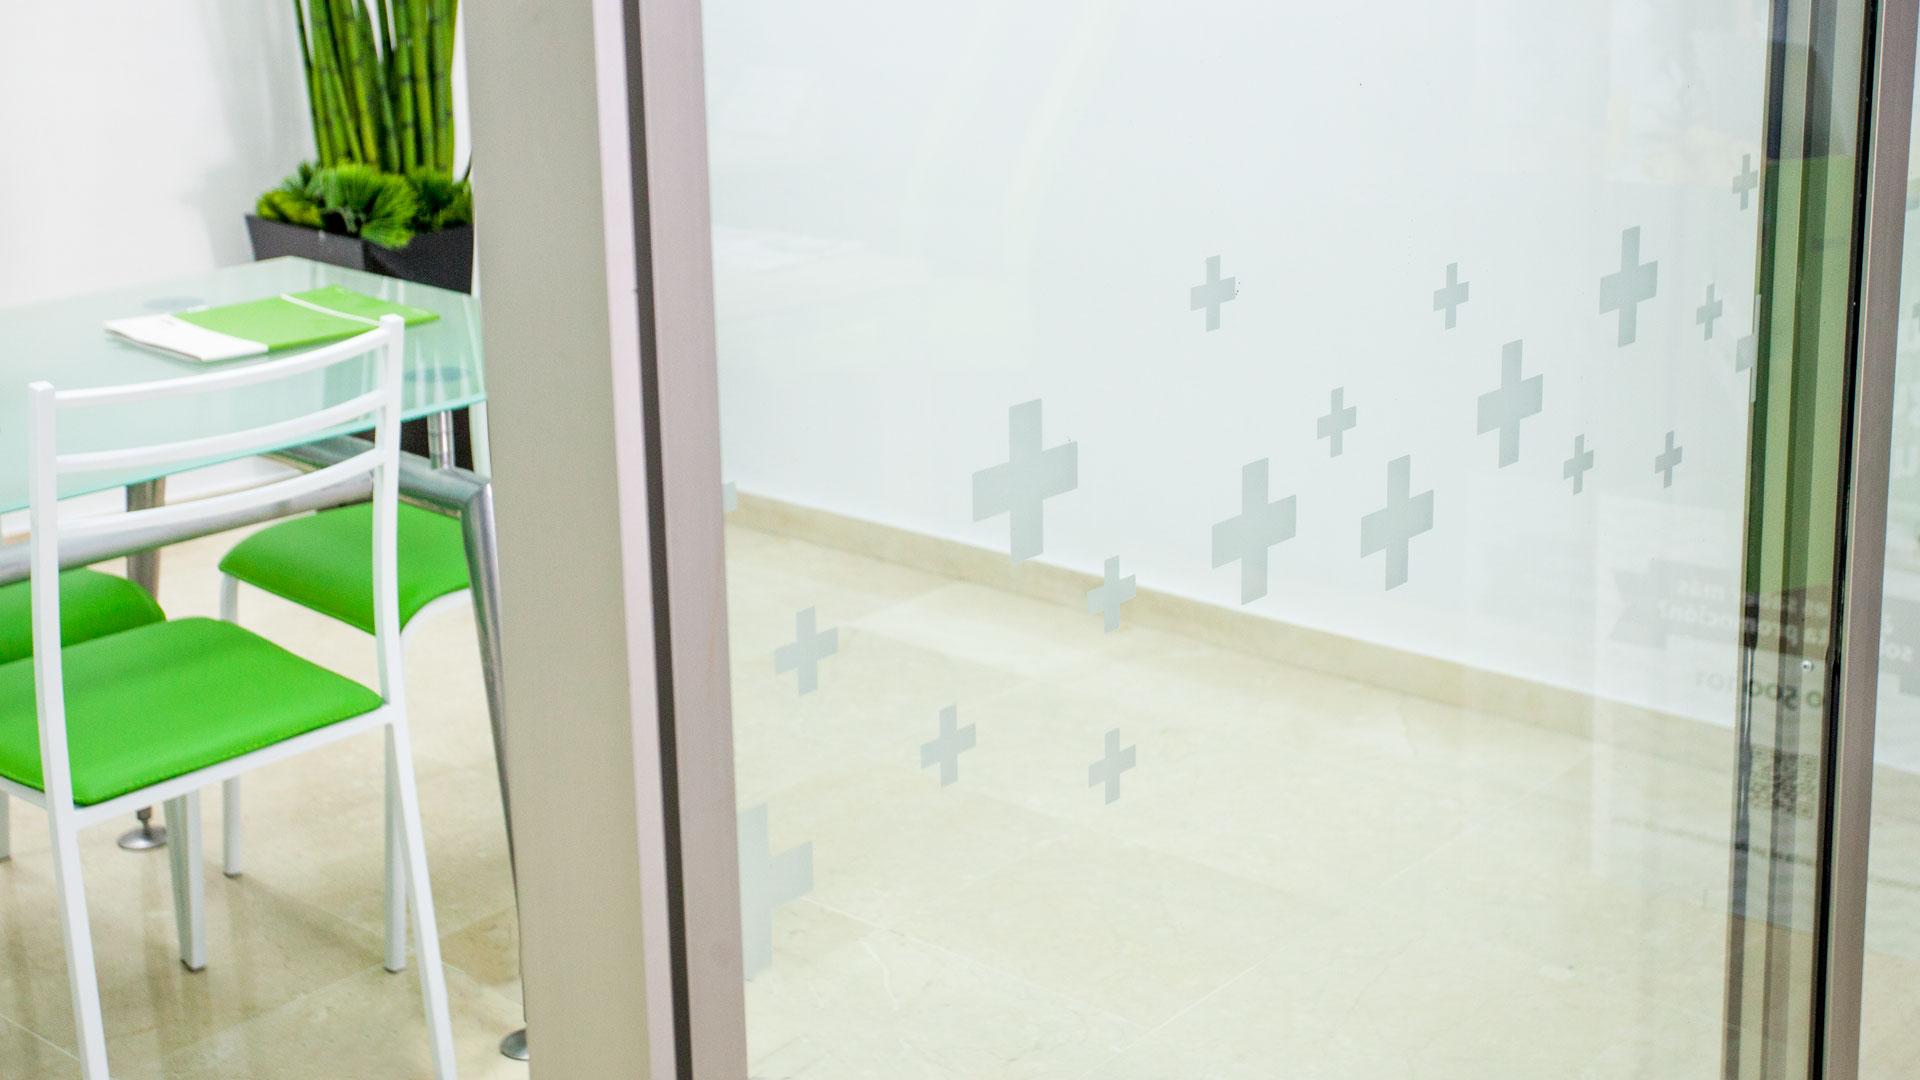 Muebles tilbury sevilla obtenga ideas dise o de muebles para su hogar aqu - Hogar decoracion sevilla ...